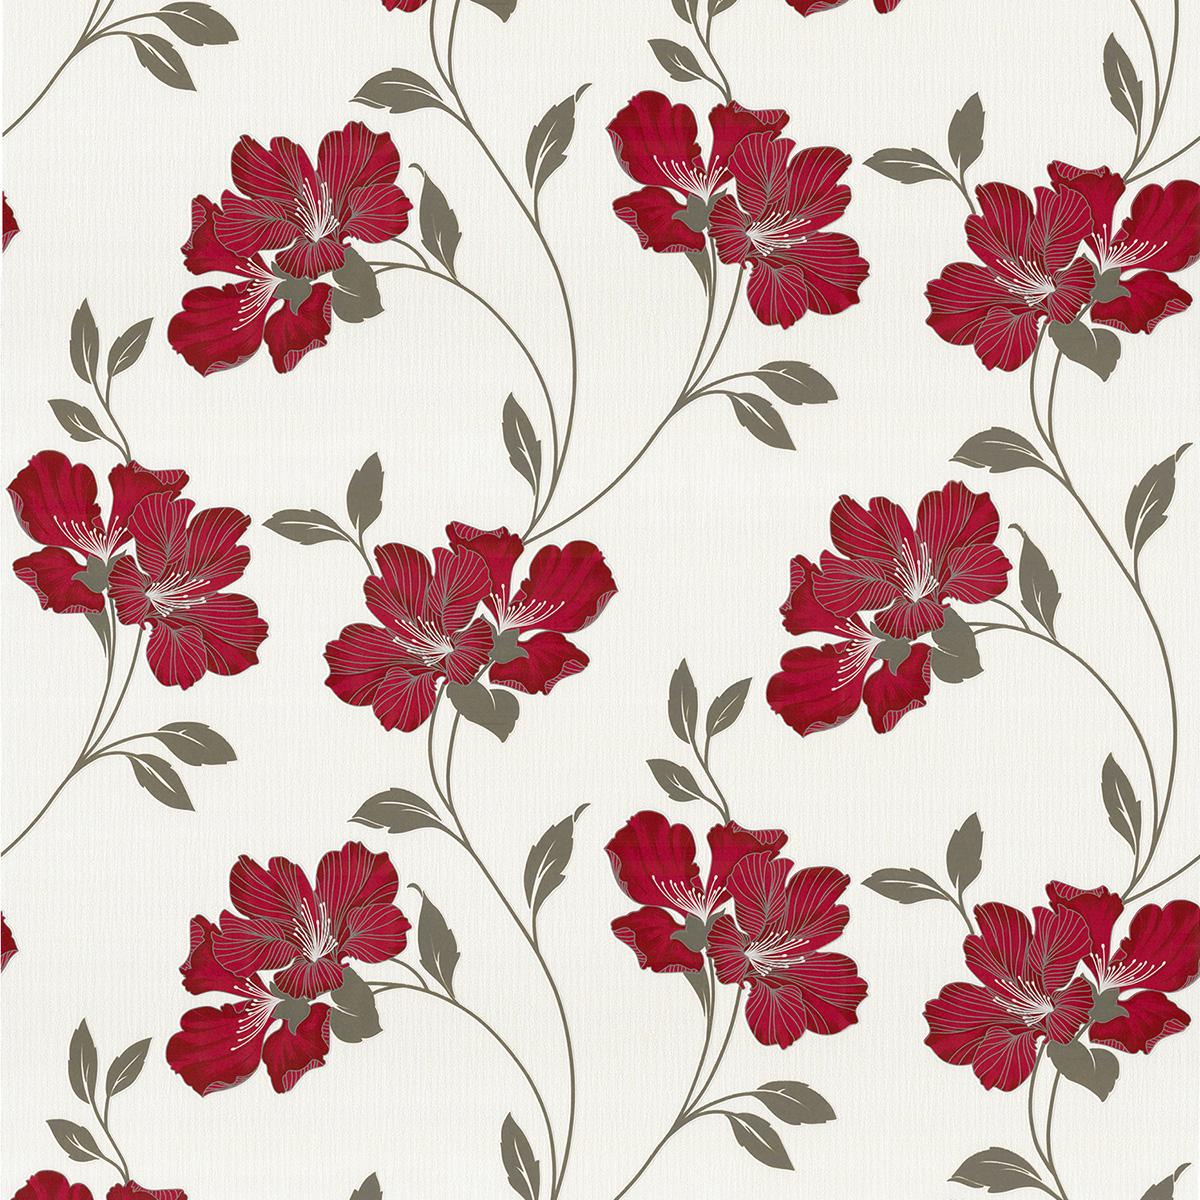 тапет Бестселър 3 червени цветя крем